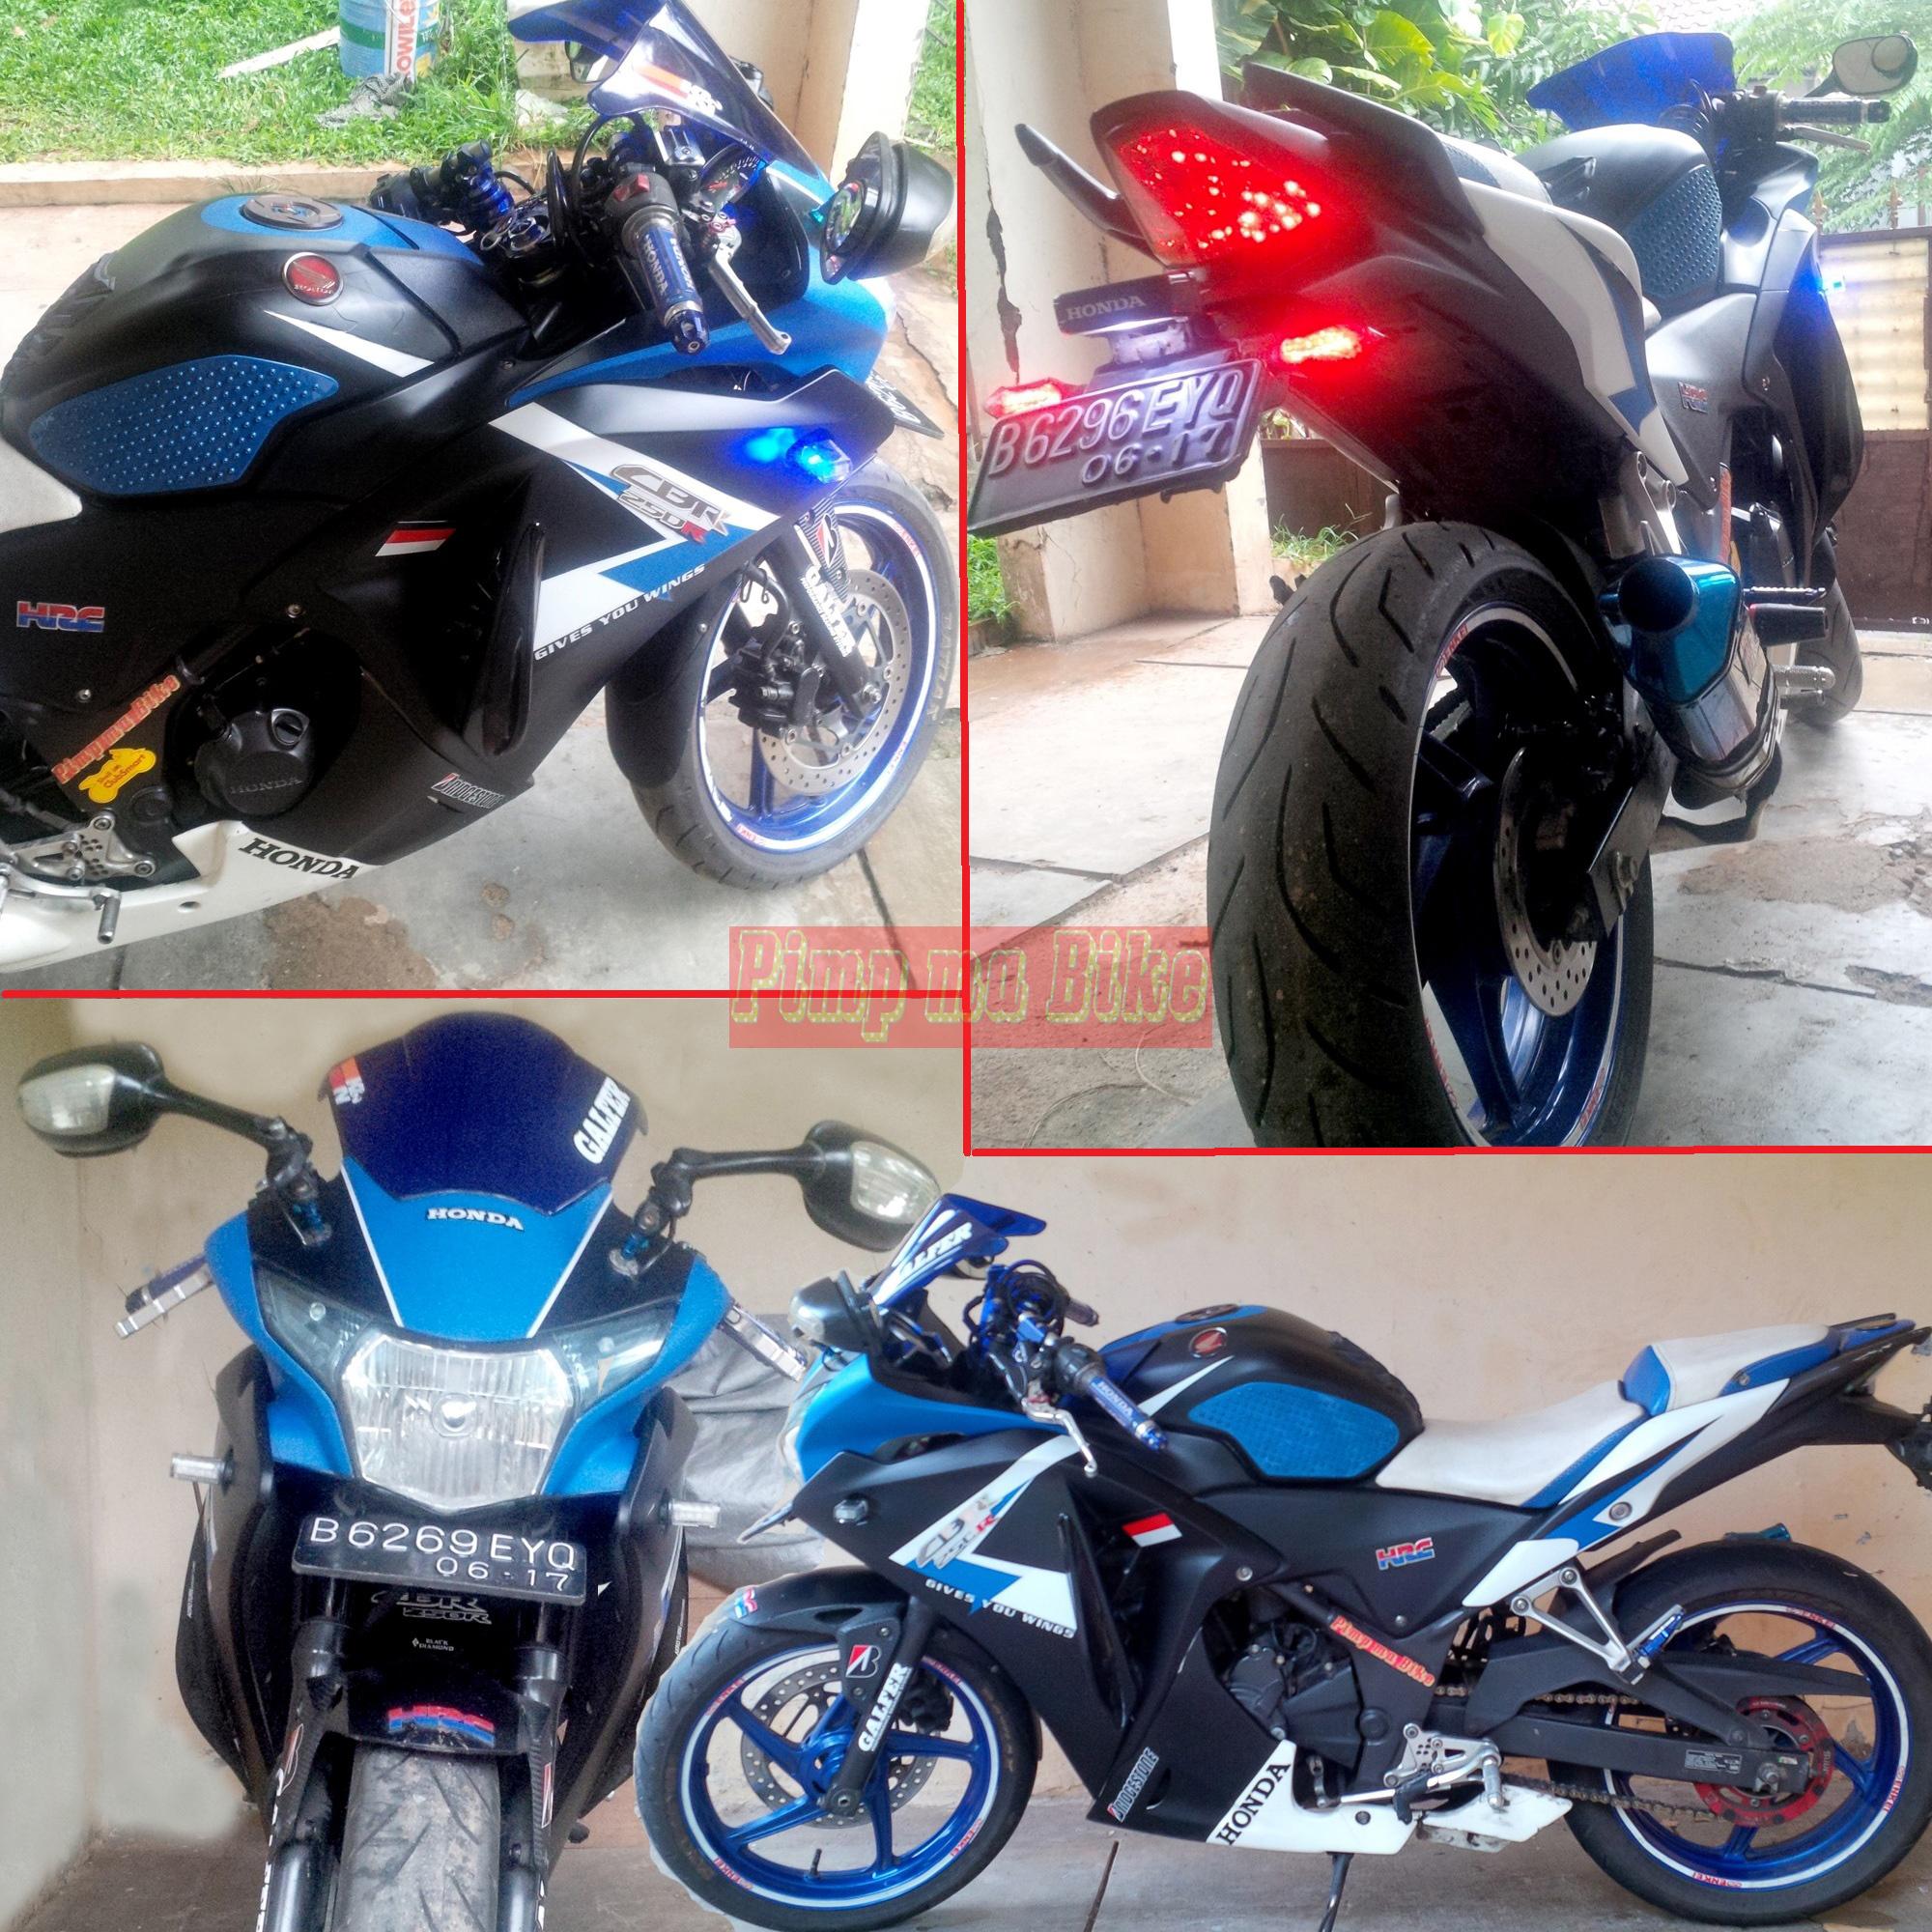 Pilihan Modifikasi Honda CBR 150R 250R New 2014 By Pimp Ma Bike